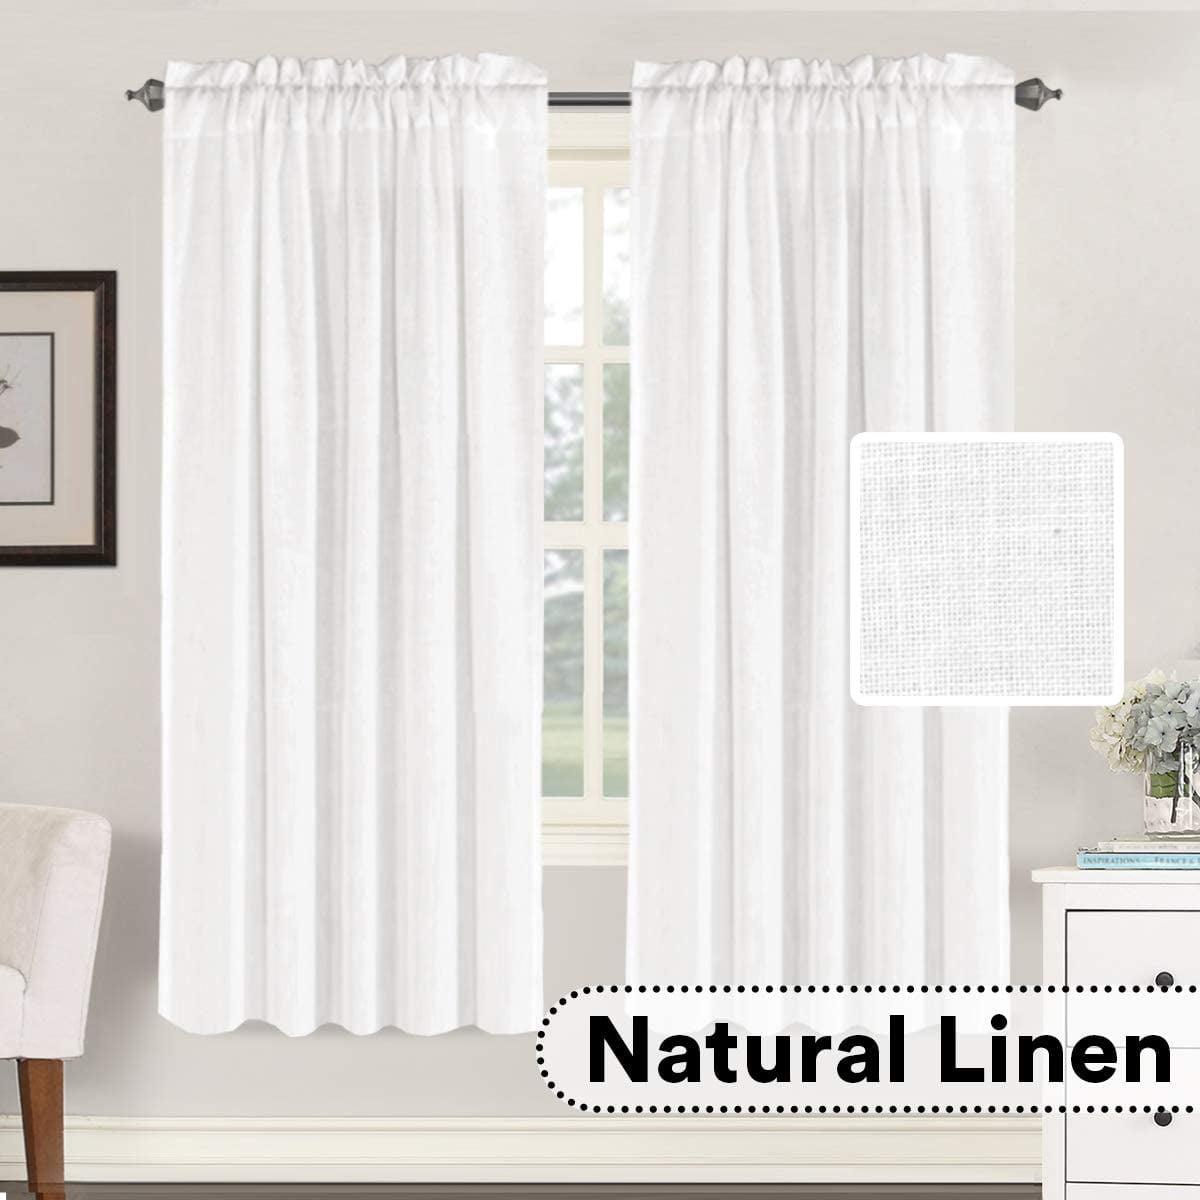 Linen Curtains Elegant Natural Linen Blended Curtains Energy Efficient Light Filtering Rod Pocket Window Treatments Panels Drapes For Livingroom Set Of 2 Pure White 52 X 72 Walmart Com Walmart Com